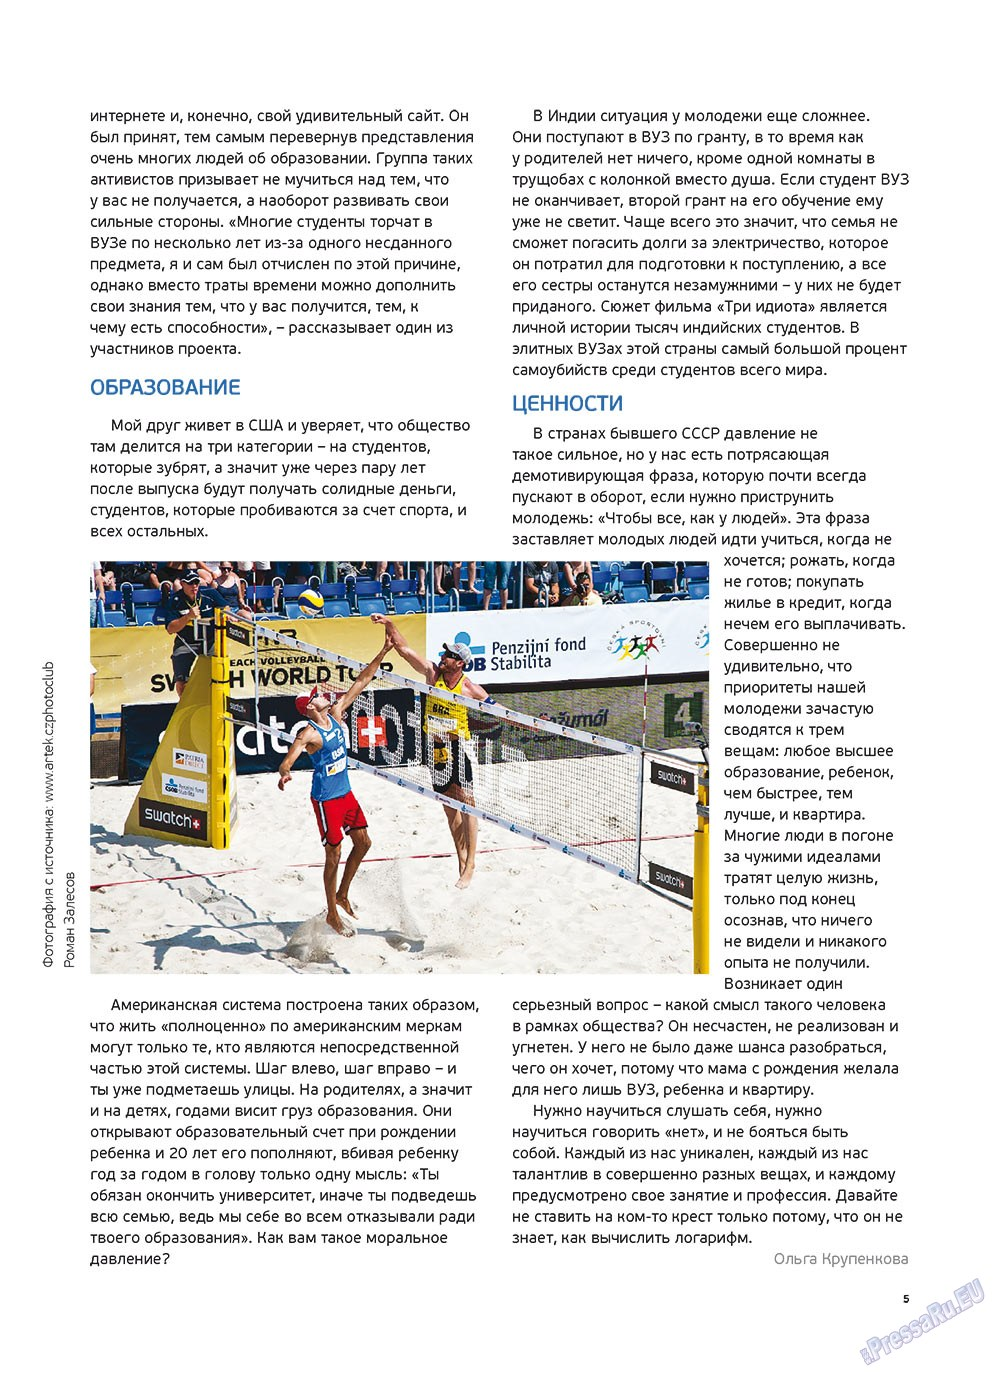 Артек (журнал). 2012 год, номер 1, стр. 7